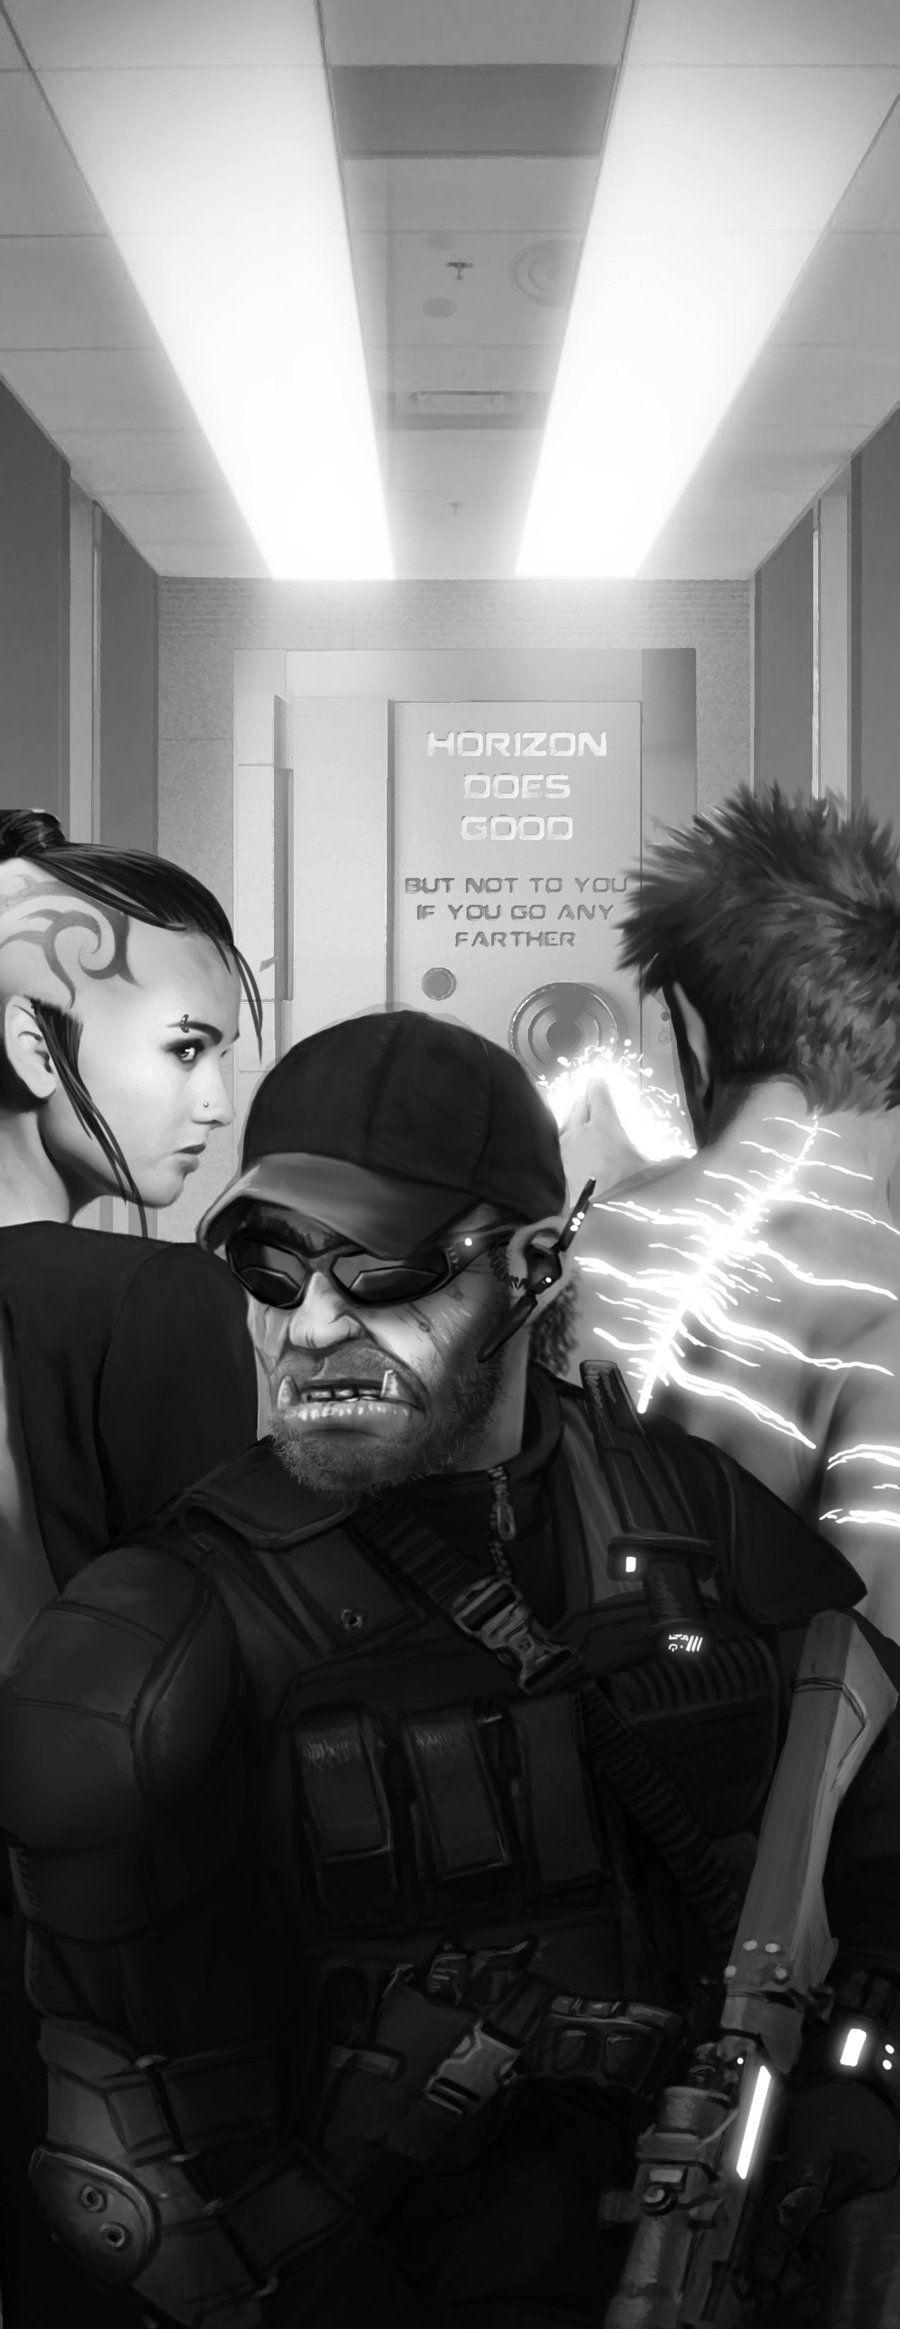 Shadowrun Horizon Artwork by Andreas Schroth. Portrait of